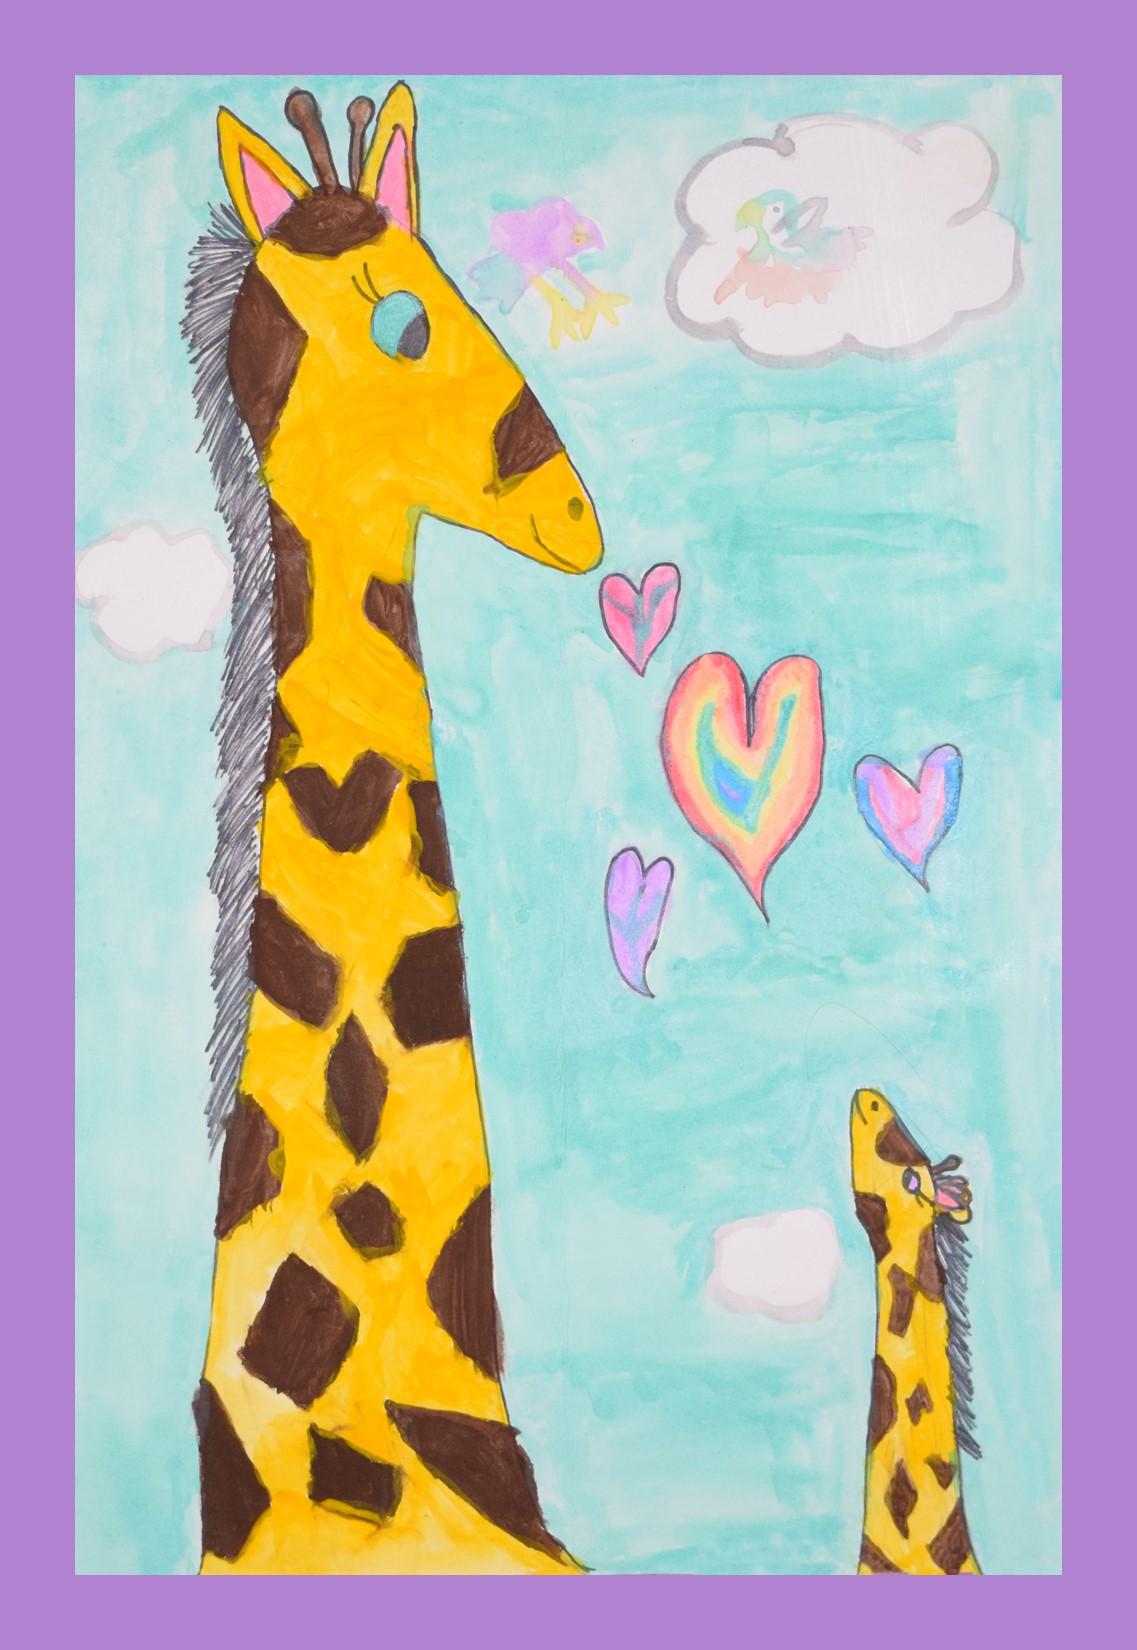 April the Giraffe and her baby, Tajire, by Raisa Cui